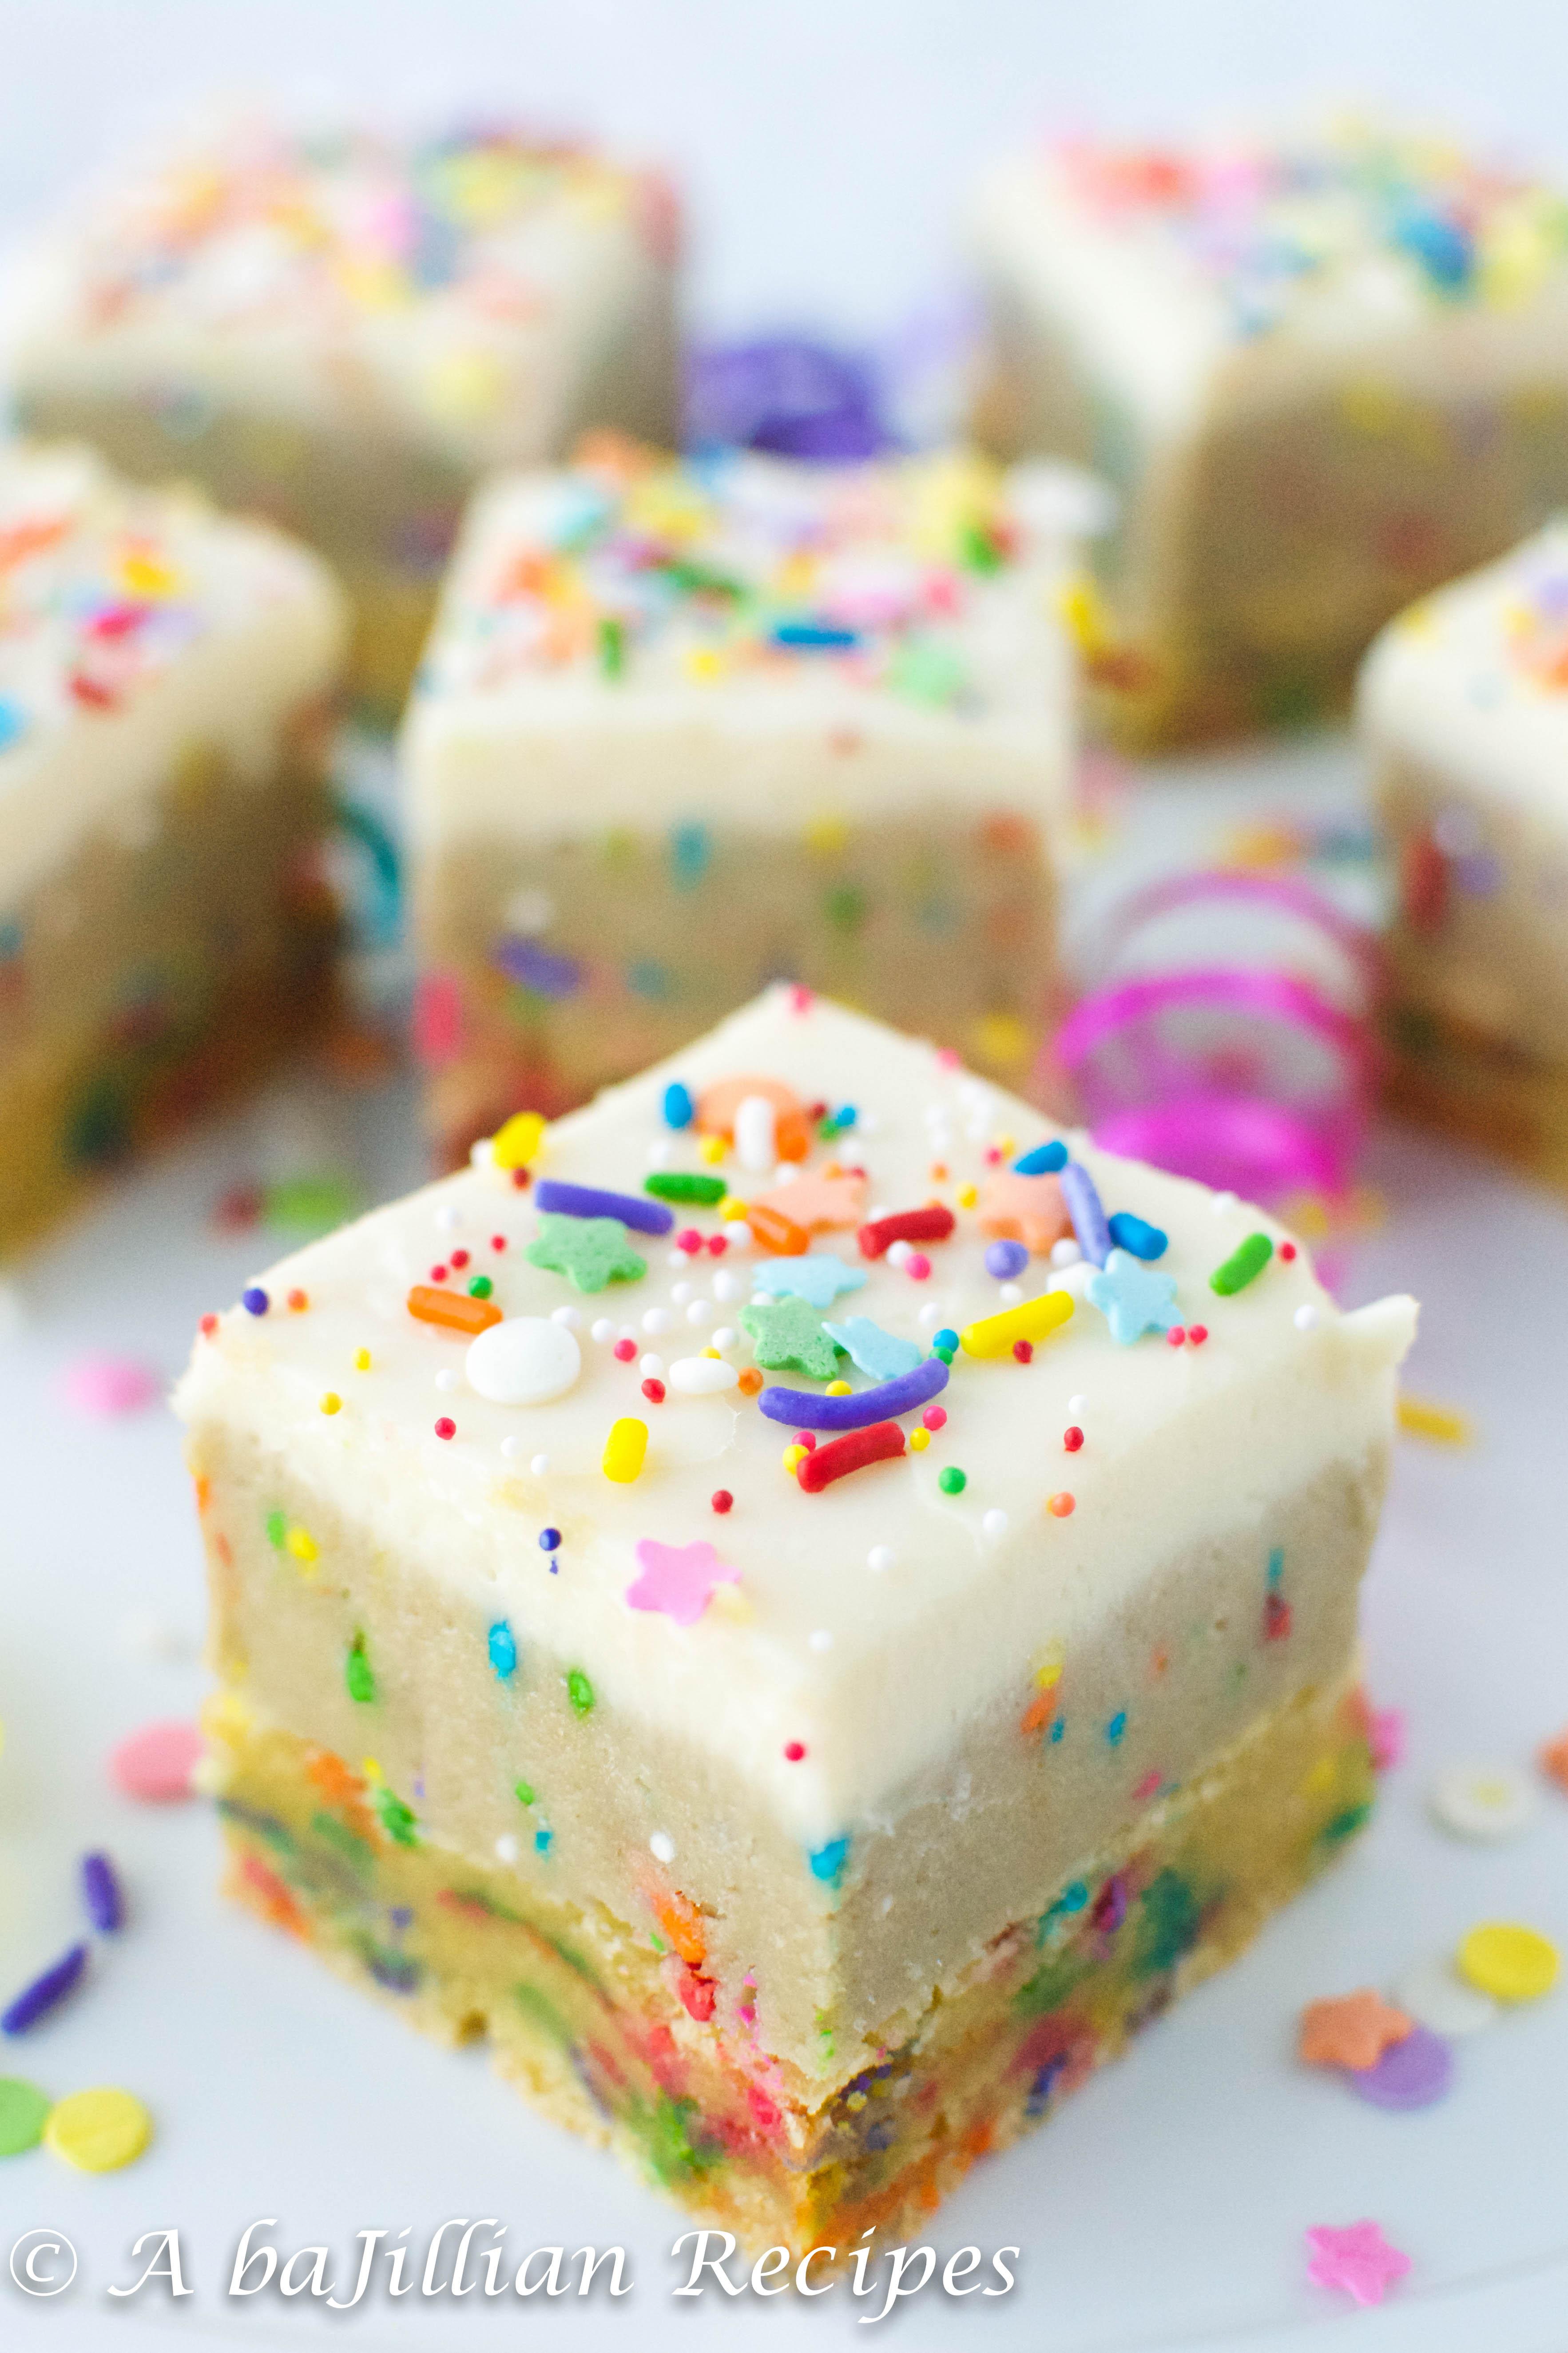 Birthday Cake Oreo Truffle Blondies  A baJillian Recipes